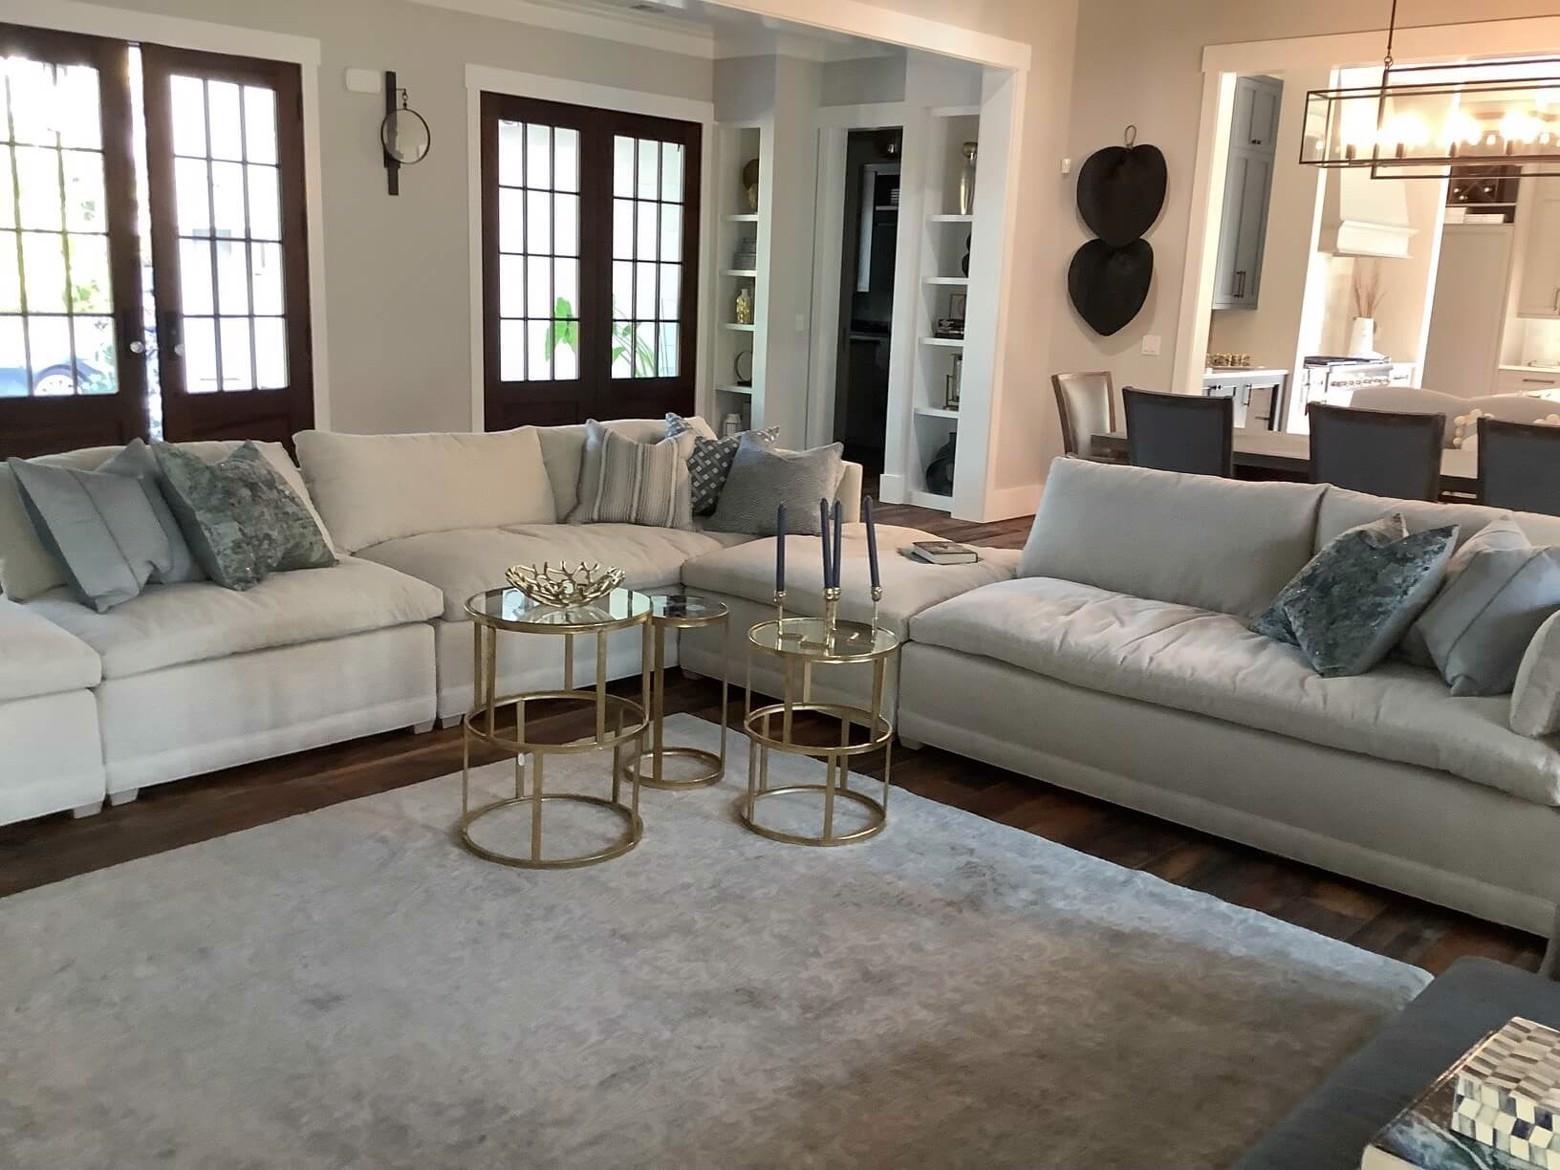 cindy-thorne-home-design-5.jpeg image